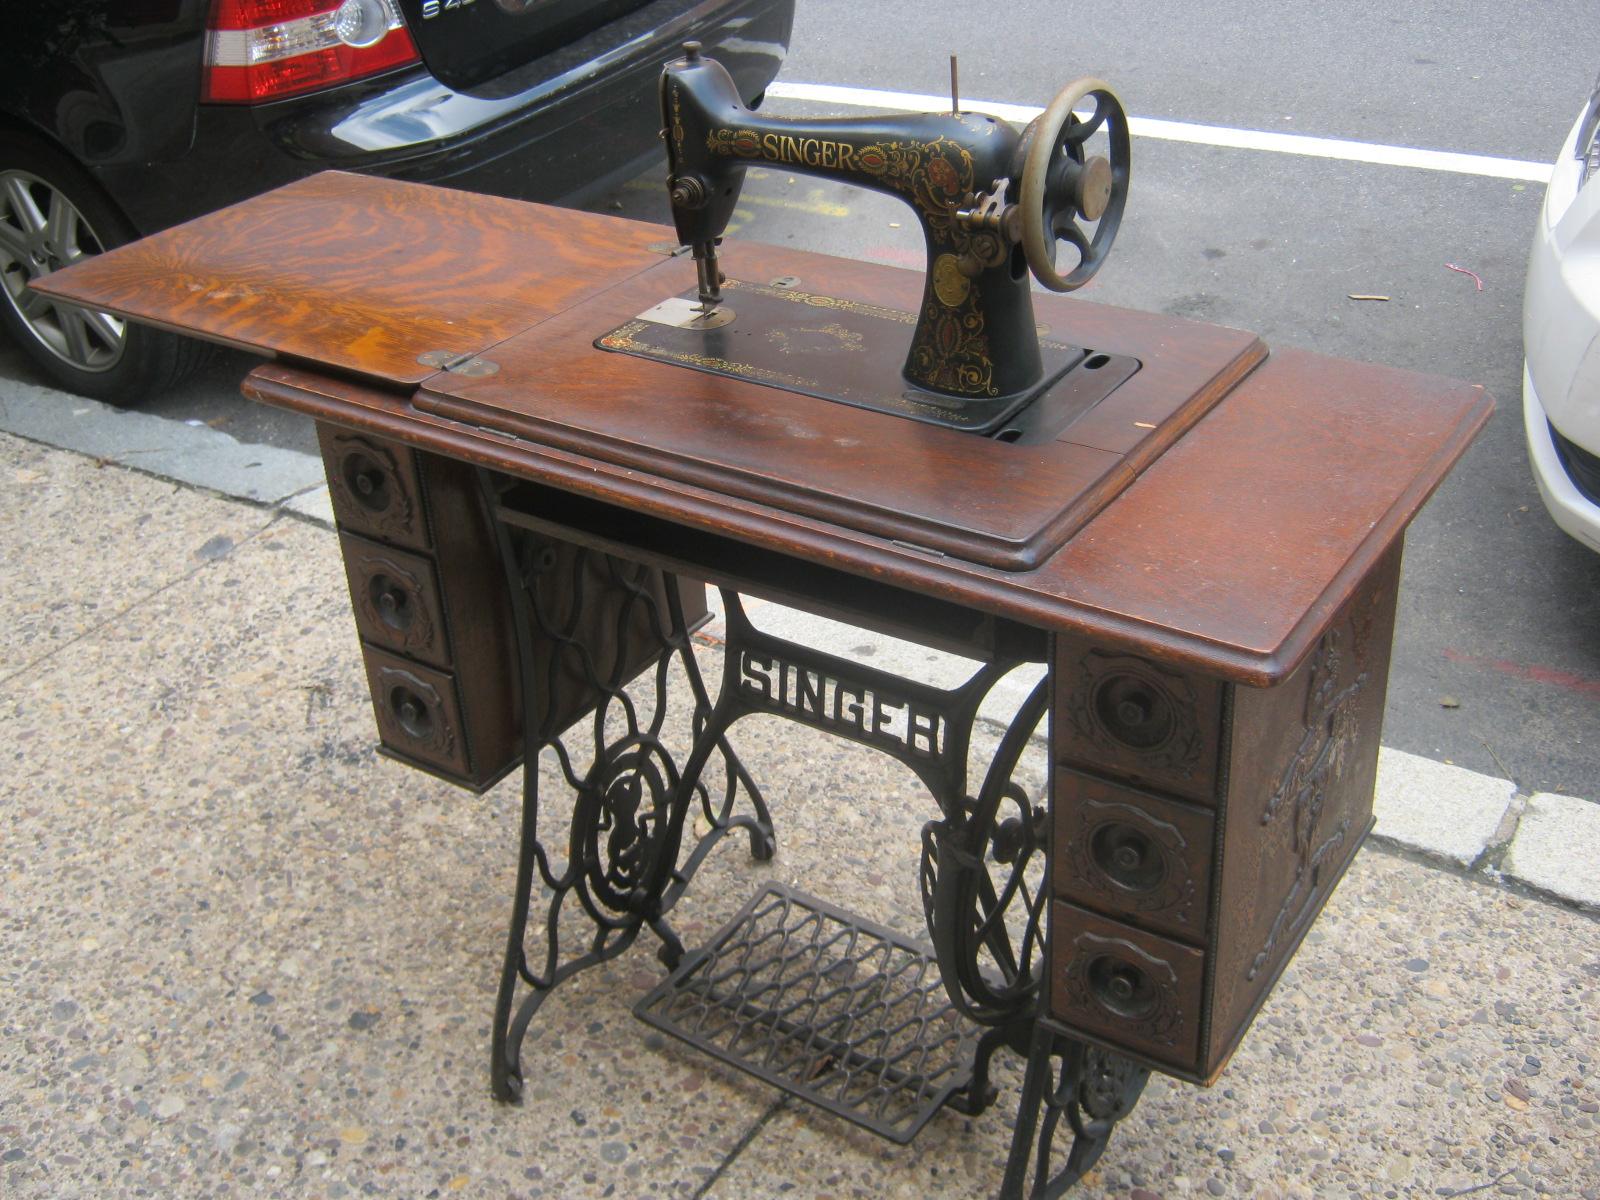 Uhuru Furniture Collectibles 1890s Singer Treadle